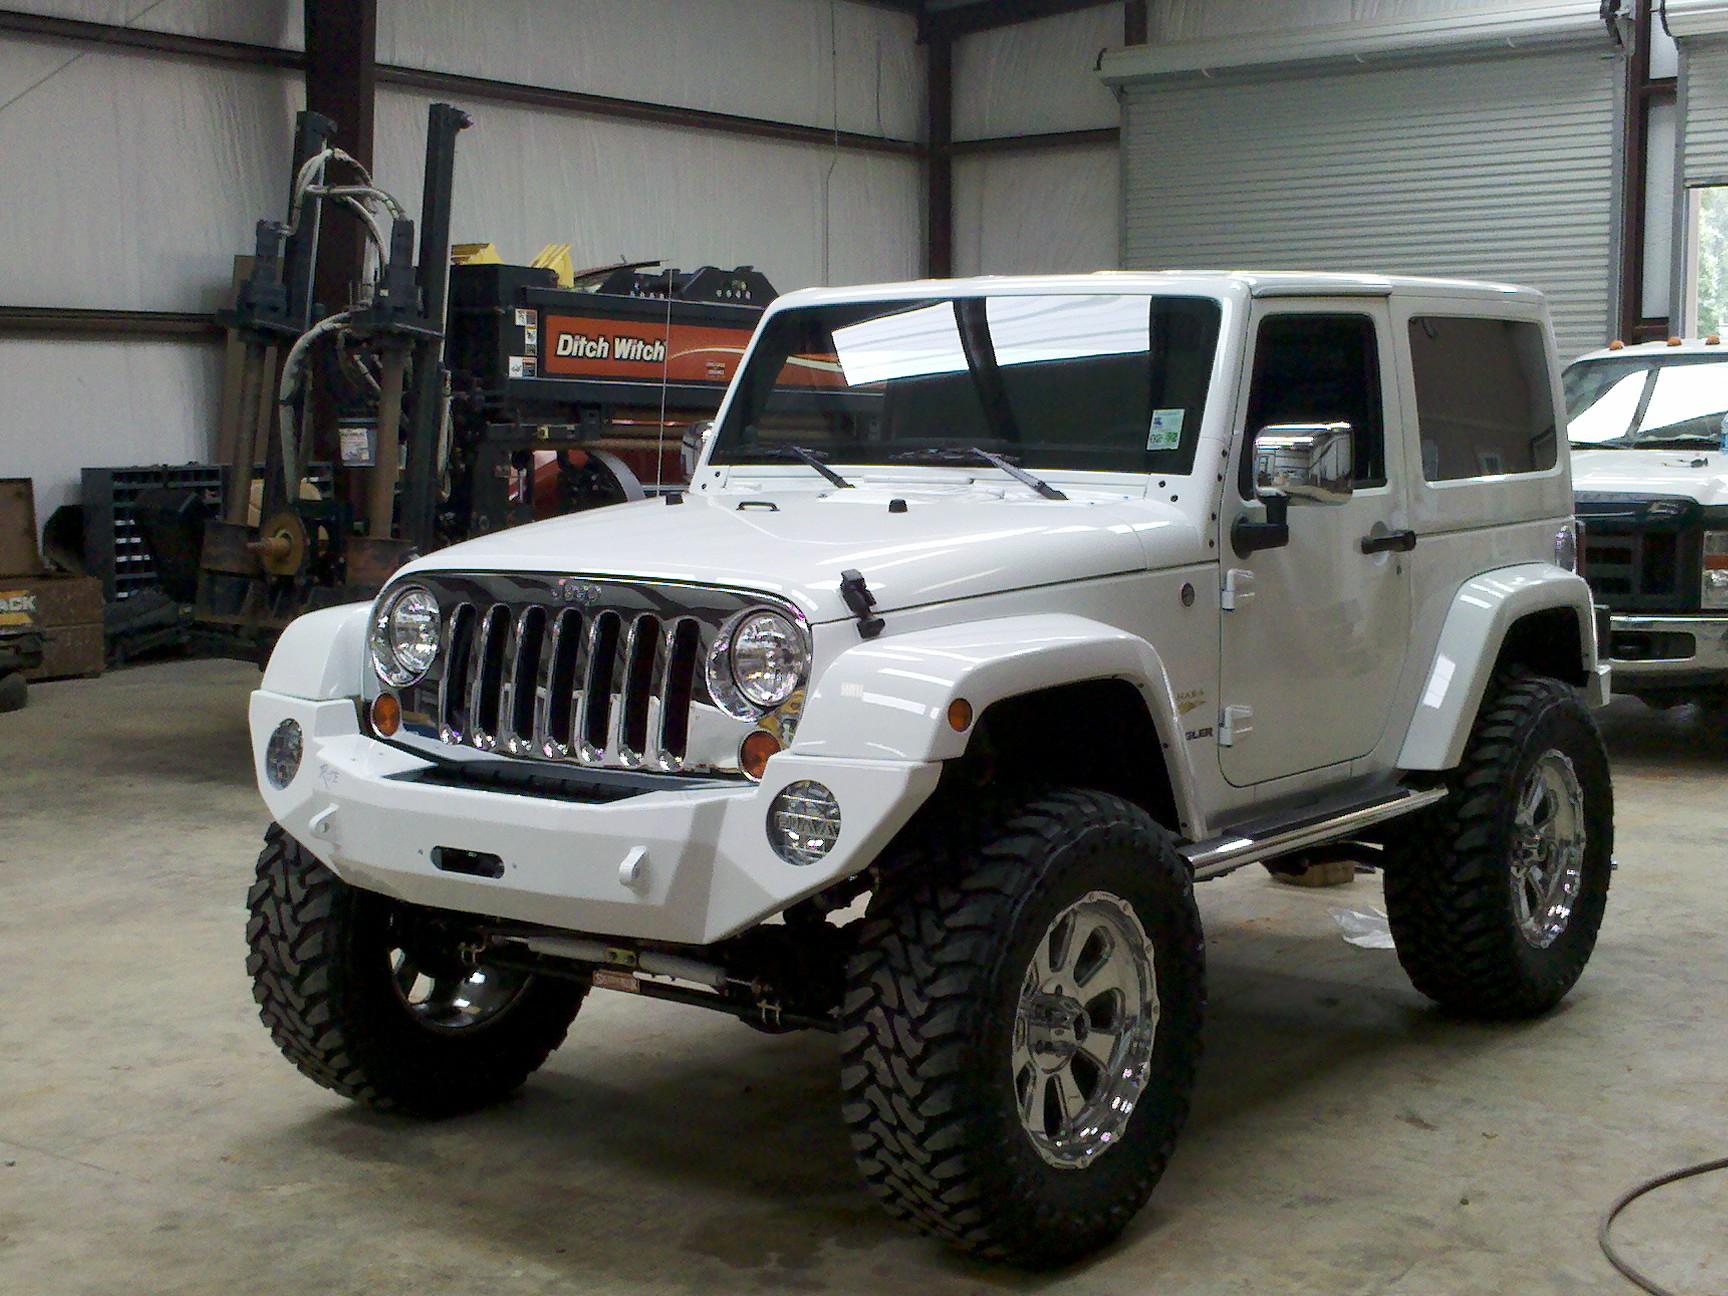 2014 jeep wrangler jk exterior 0 html code jeep liberty lifted white thecolorsofkindergarten